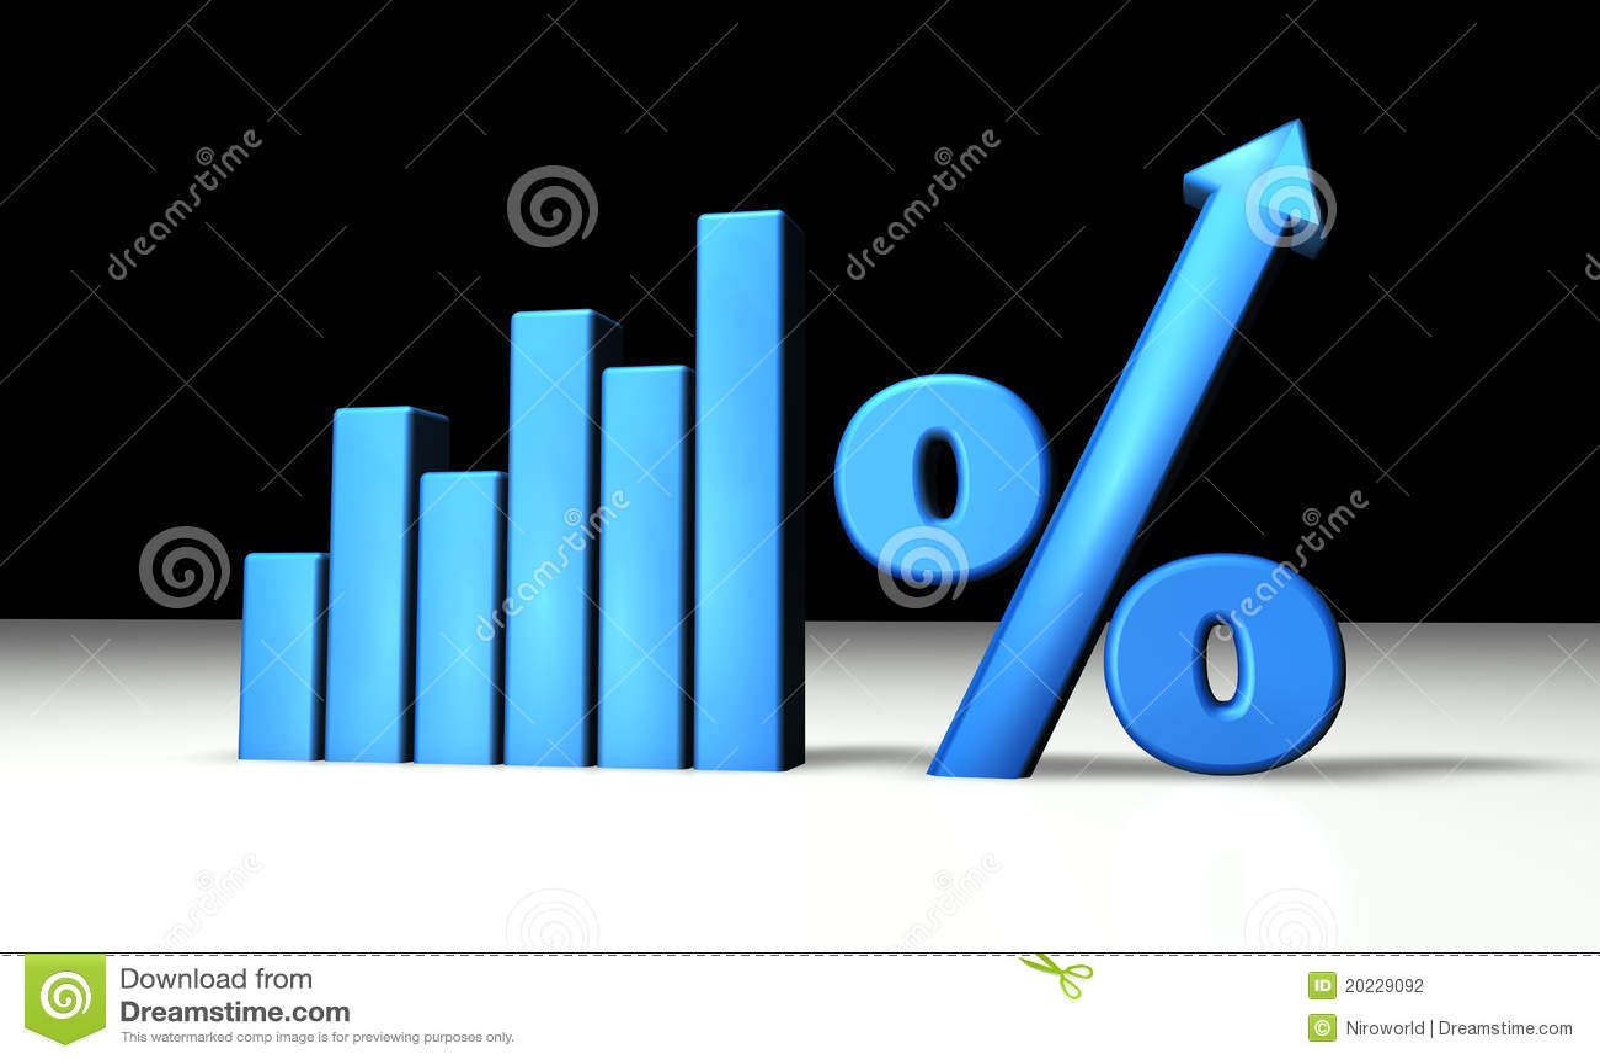 graphique bleu de pourcentage illustration stock image 20229092. Black Bedroom Furniture Sets. Home Design Ideas